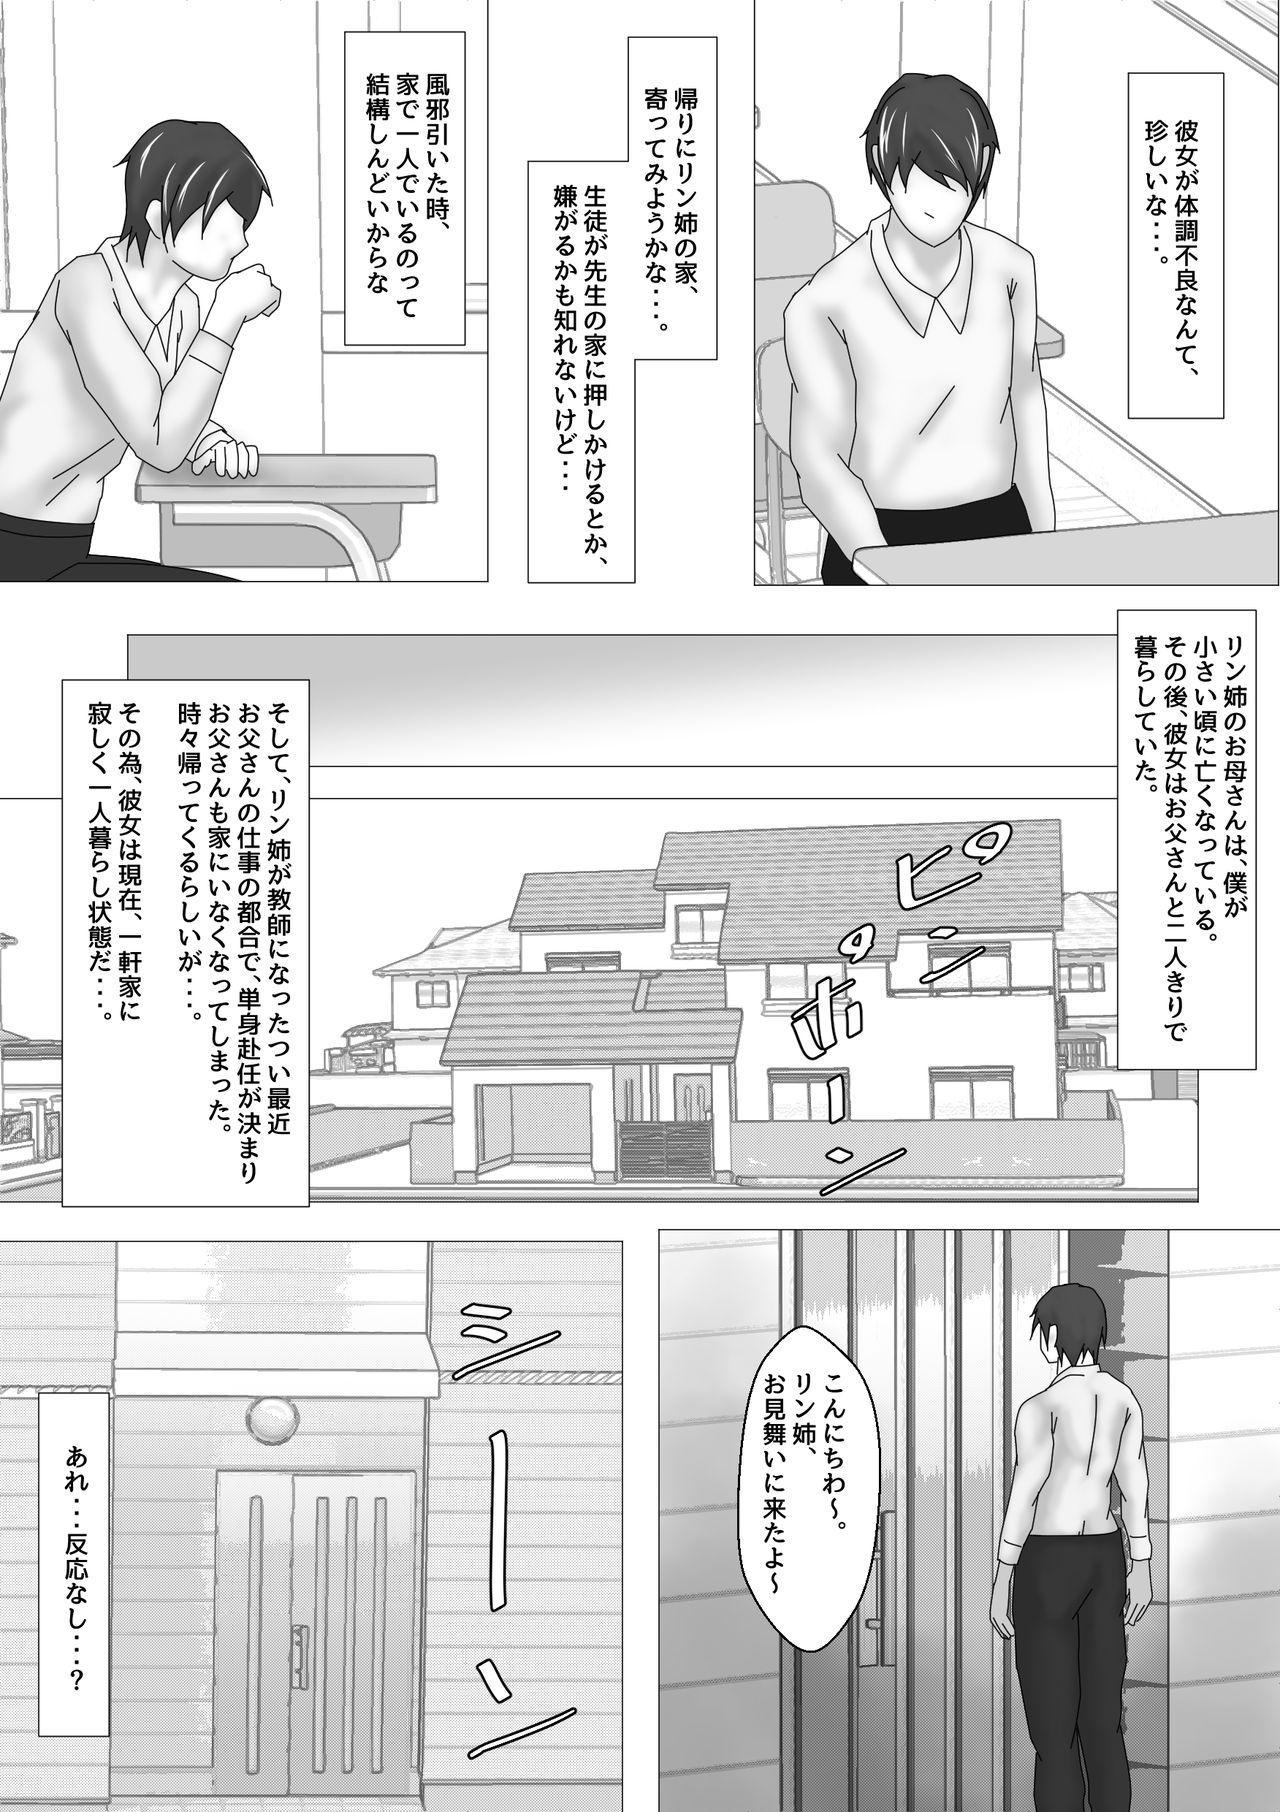 Jokyoushi Shinozaki Rin no Choukyou Kiroku Dai 3 Zenhan | Female Teacher Rin Shinozaki's Training Record 3 First Half 4